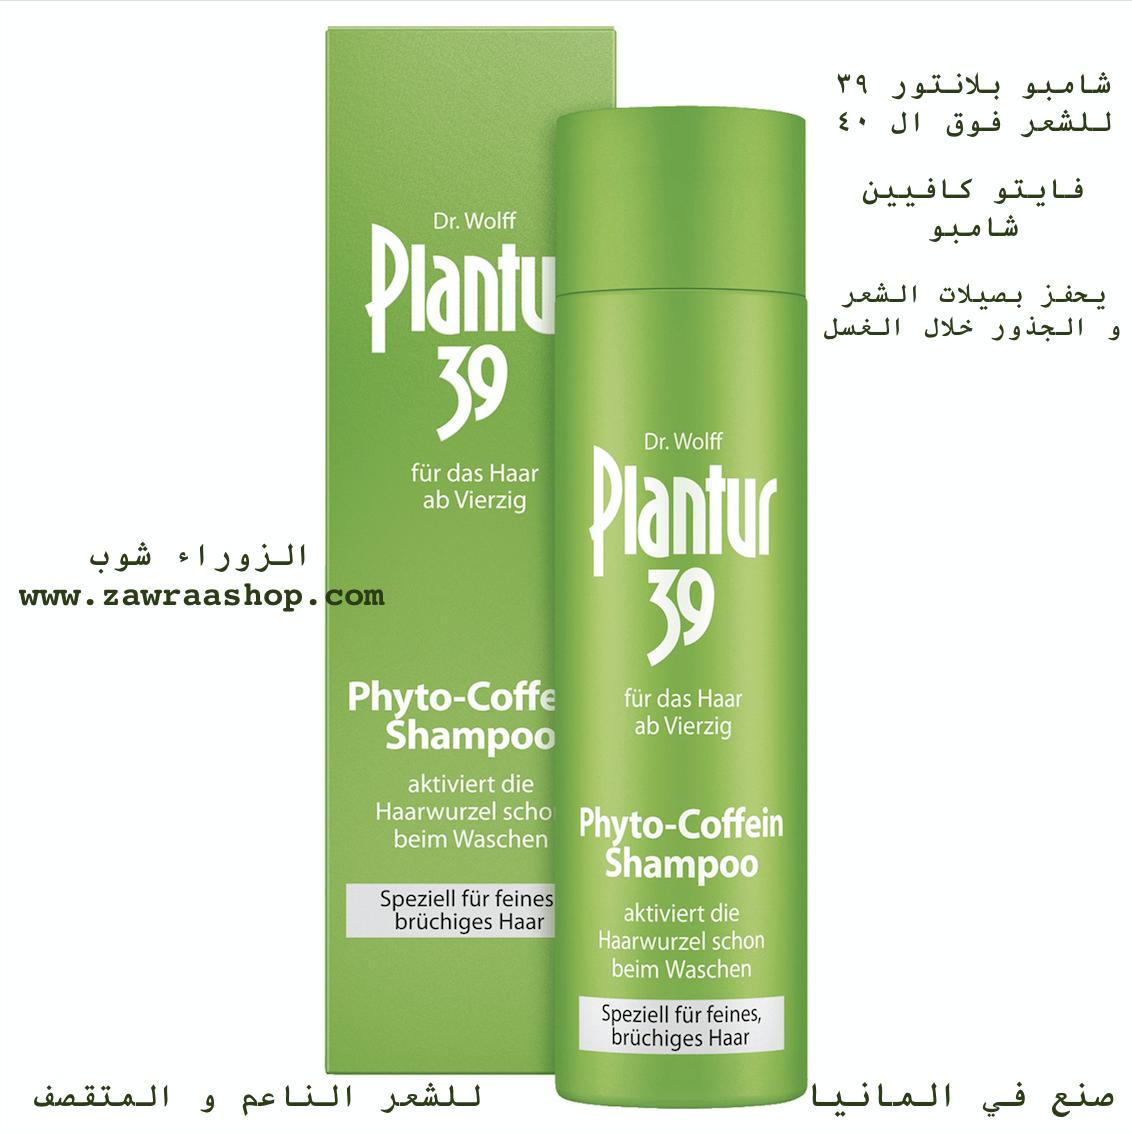 B402 Plantur 39 Phyto-Caffeine shampoo 250ml شامبو بلانتور الالماني